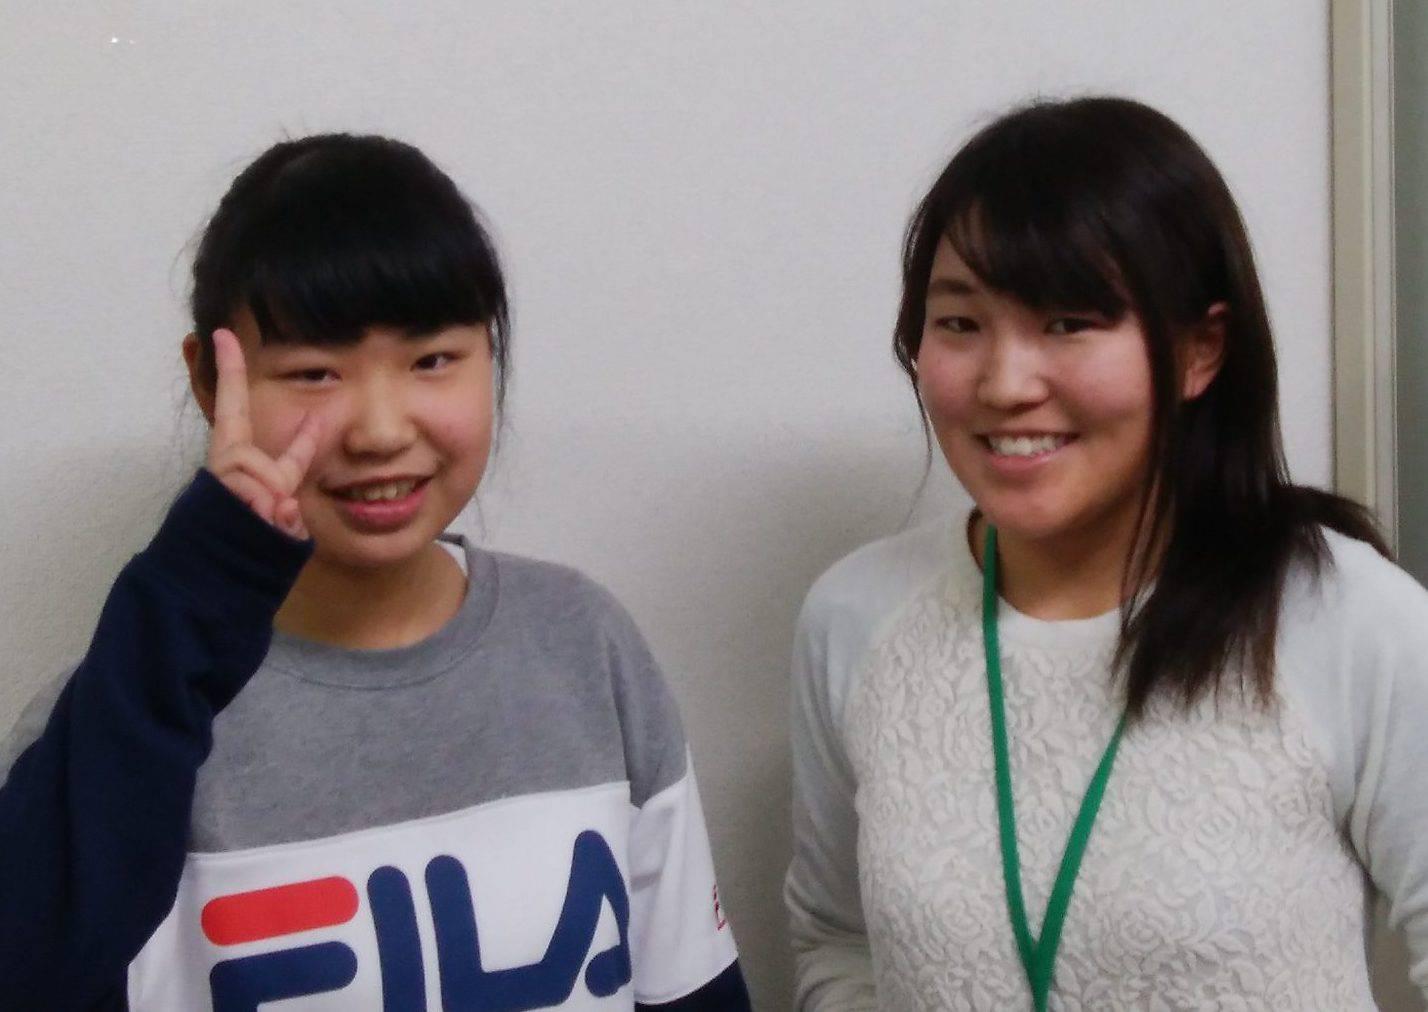 H29春 中学2年 平田沙穂さん 勝先生